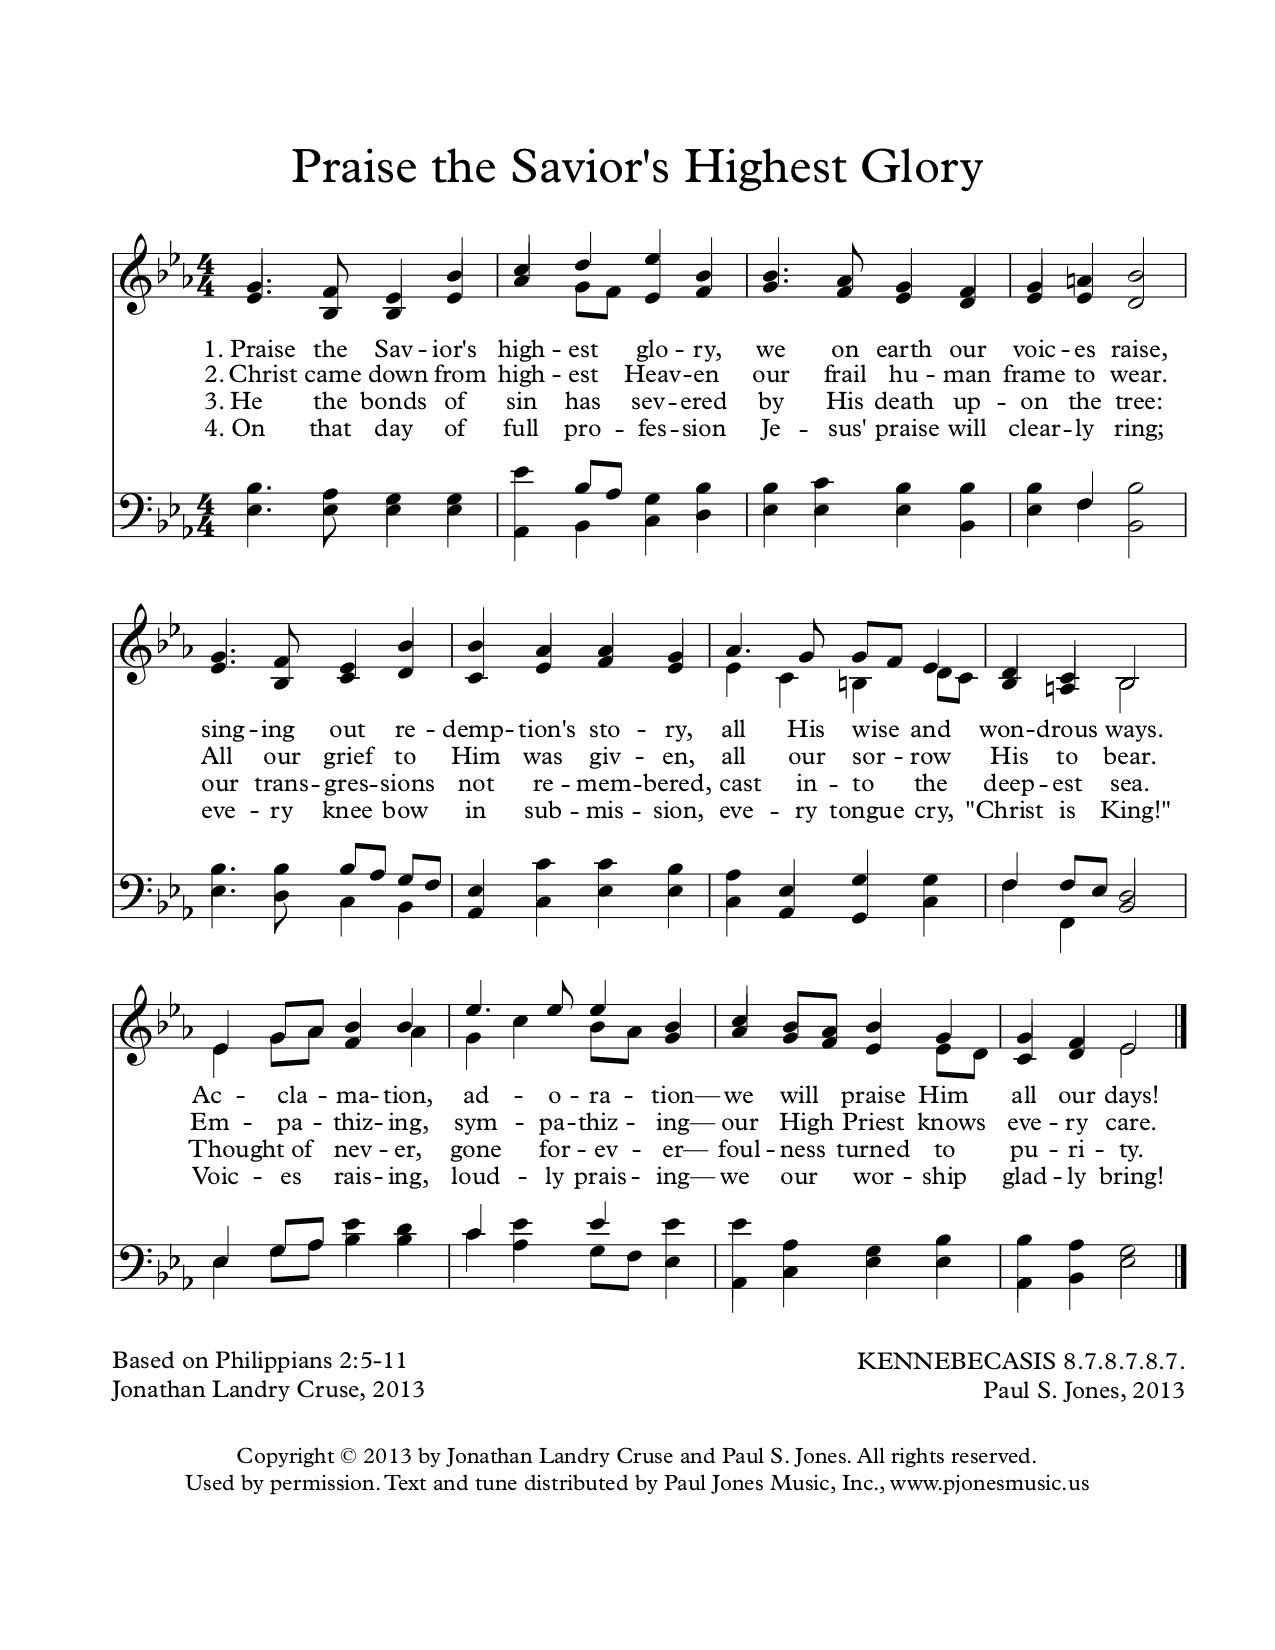 Praise the Savior's Highest Glory -